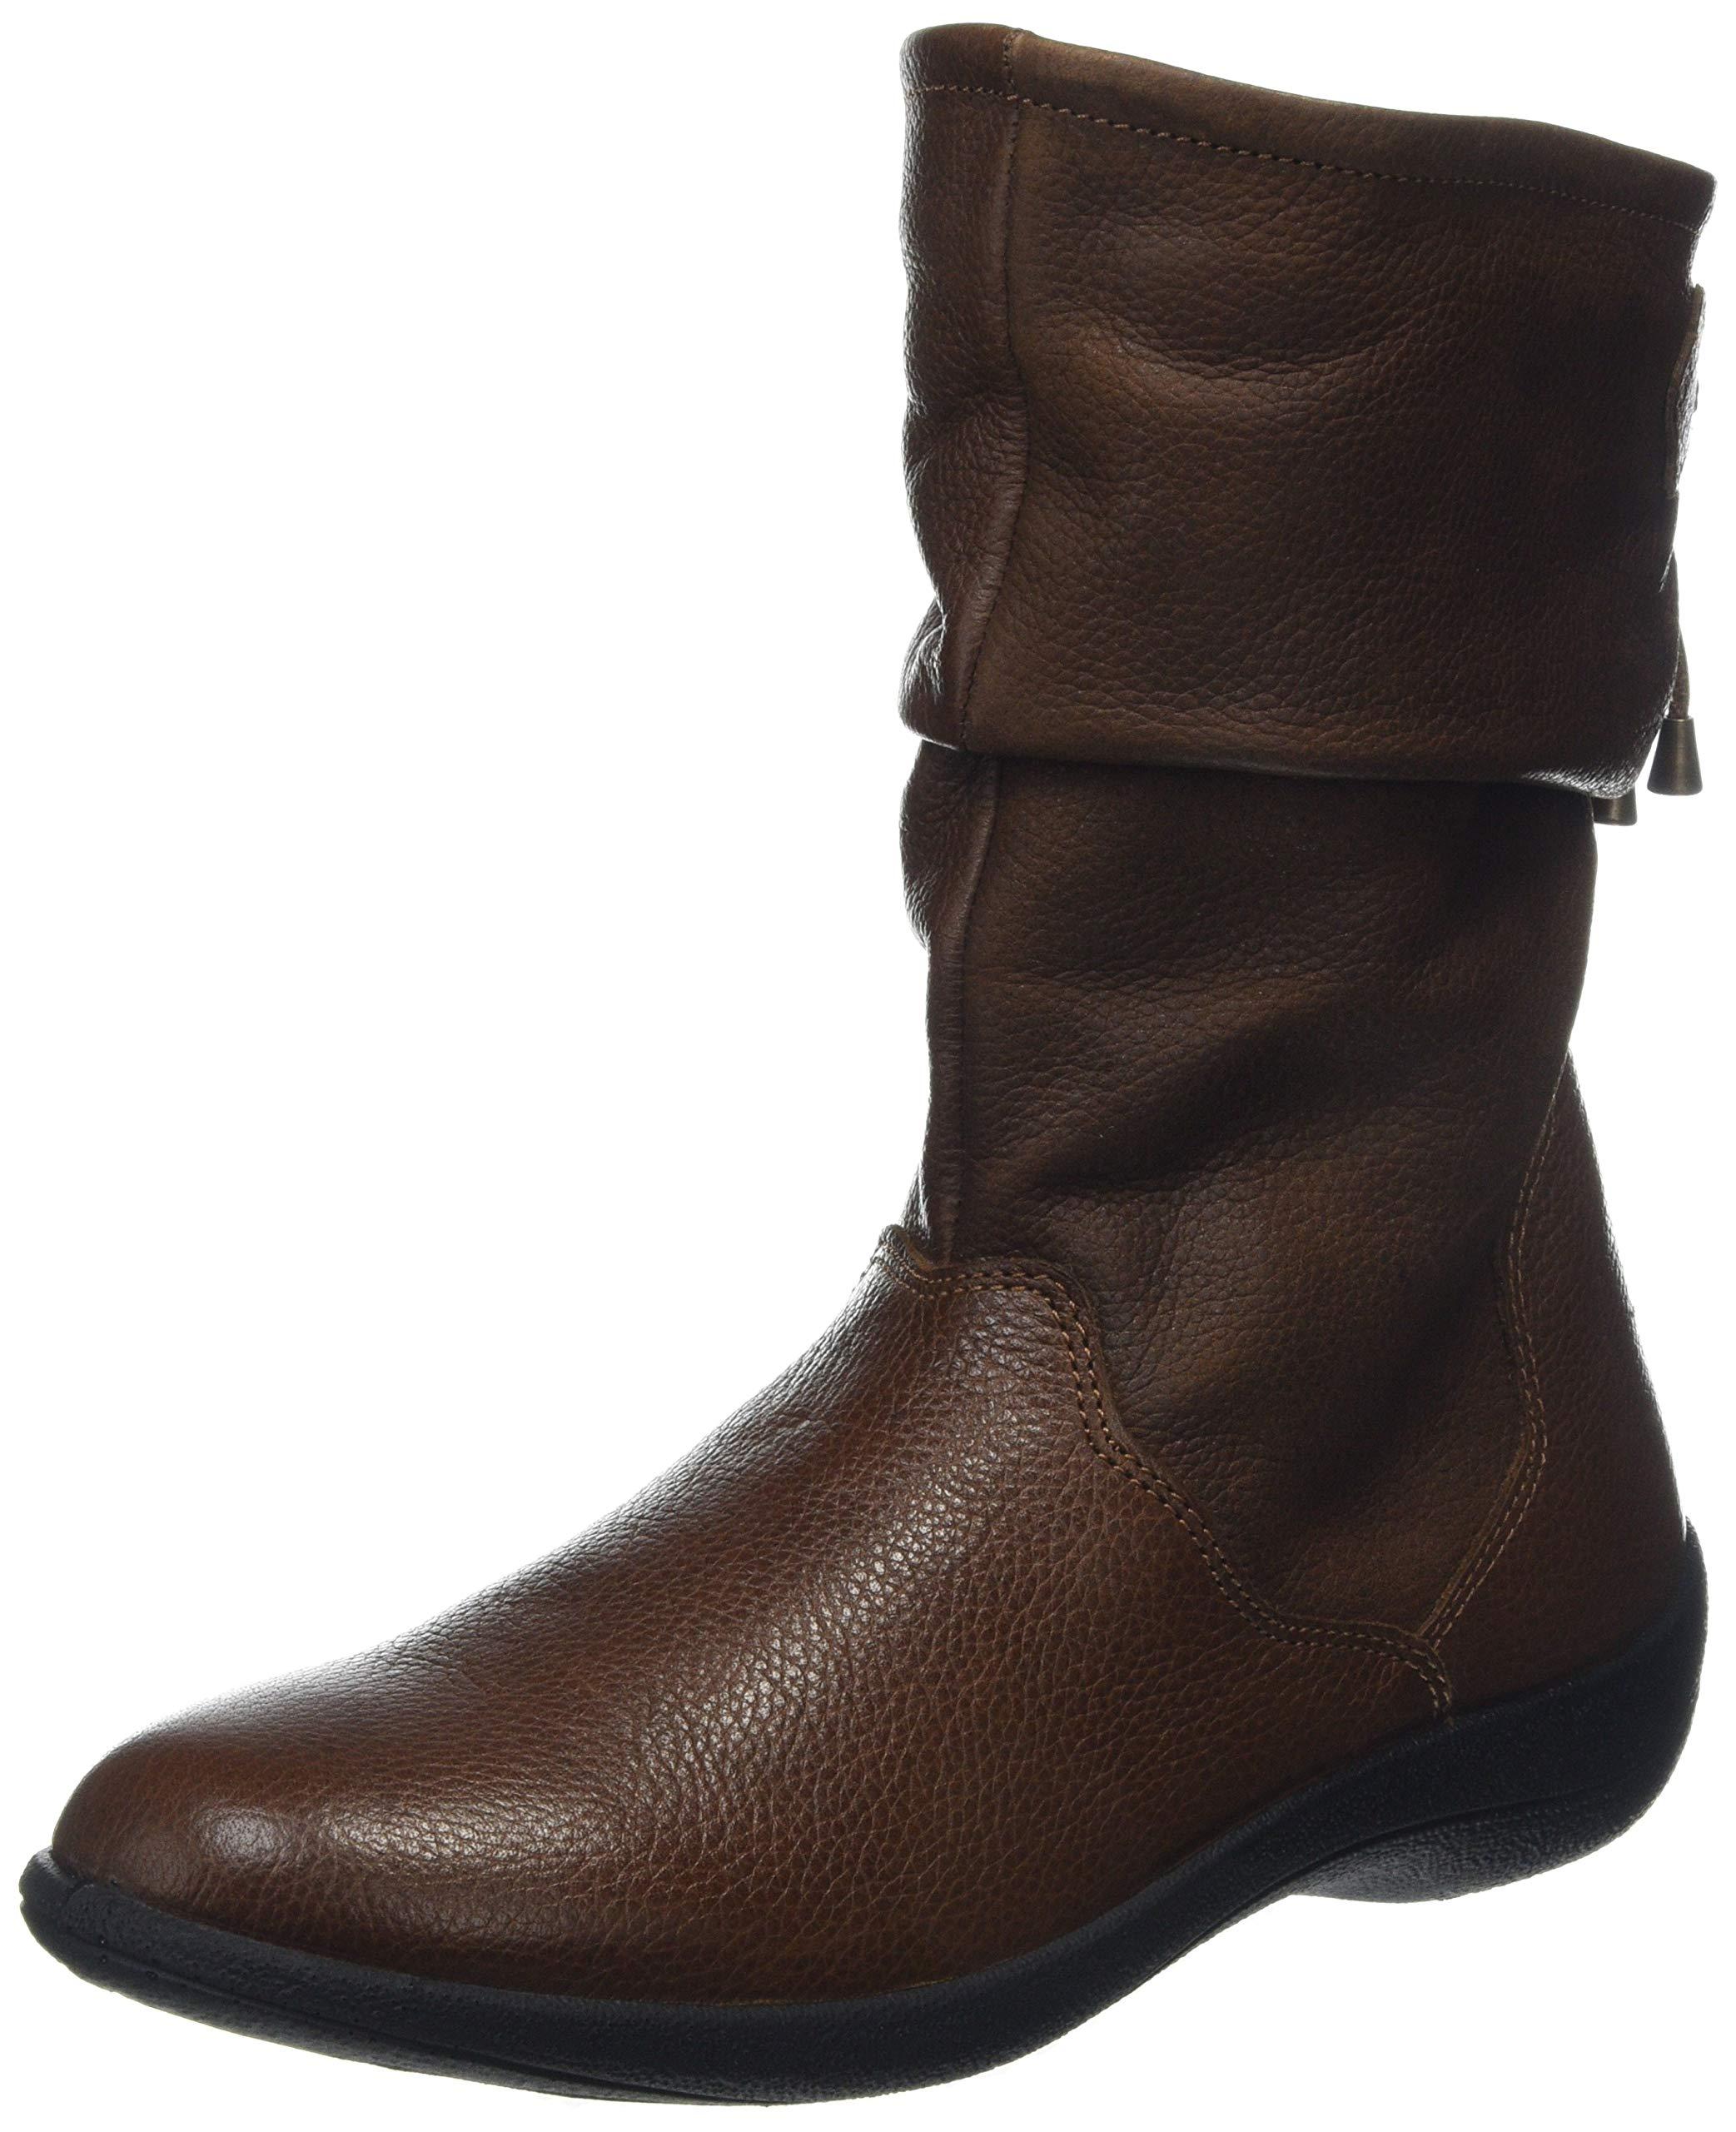 Padders Tan ReganChelsea FemmeMulticoloredark Eu Boots 8939 WIYEHD29